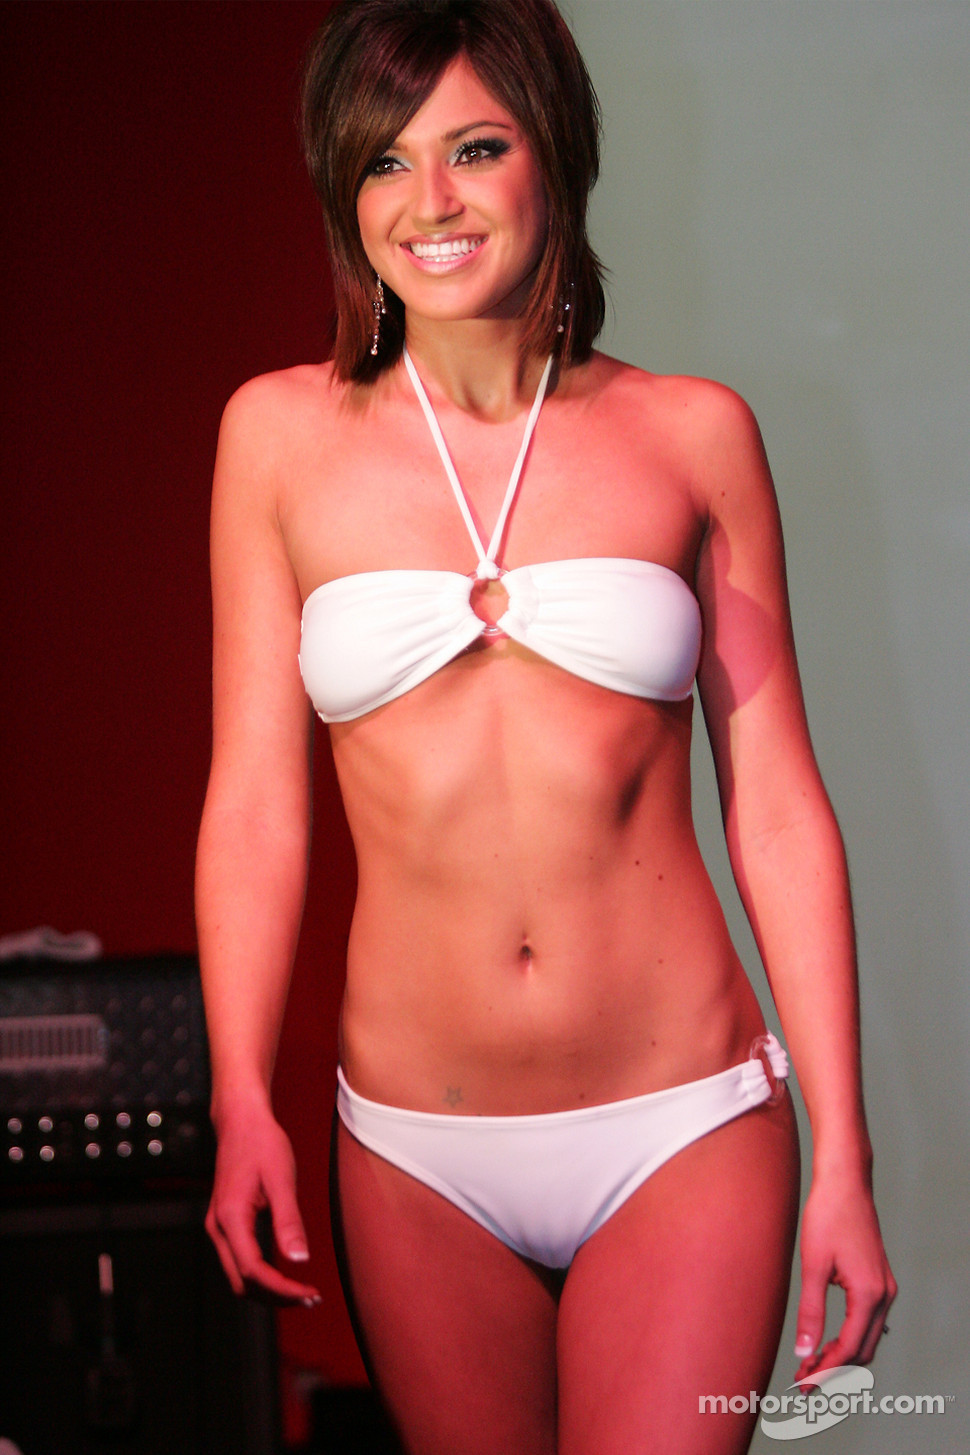 richmond motosports bikini contest